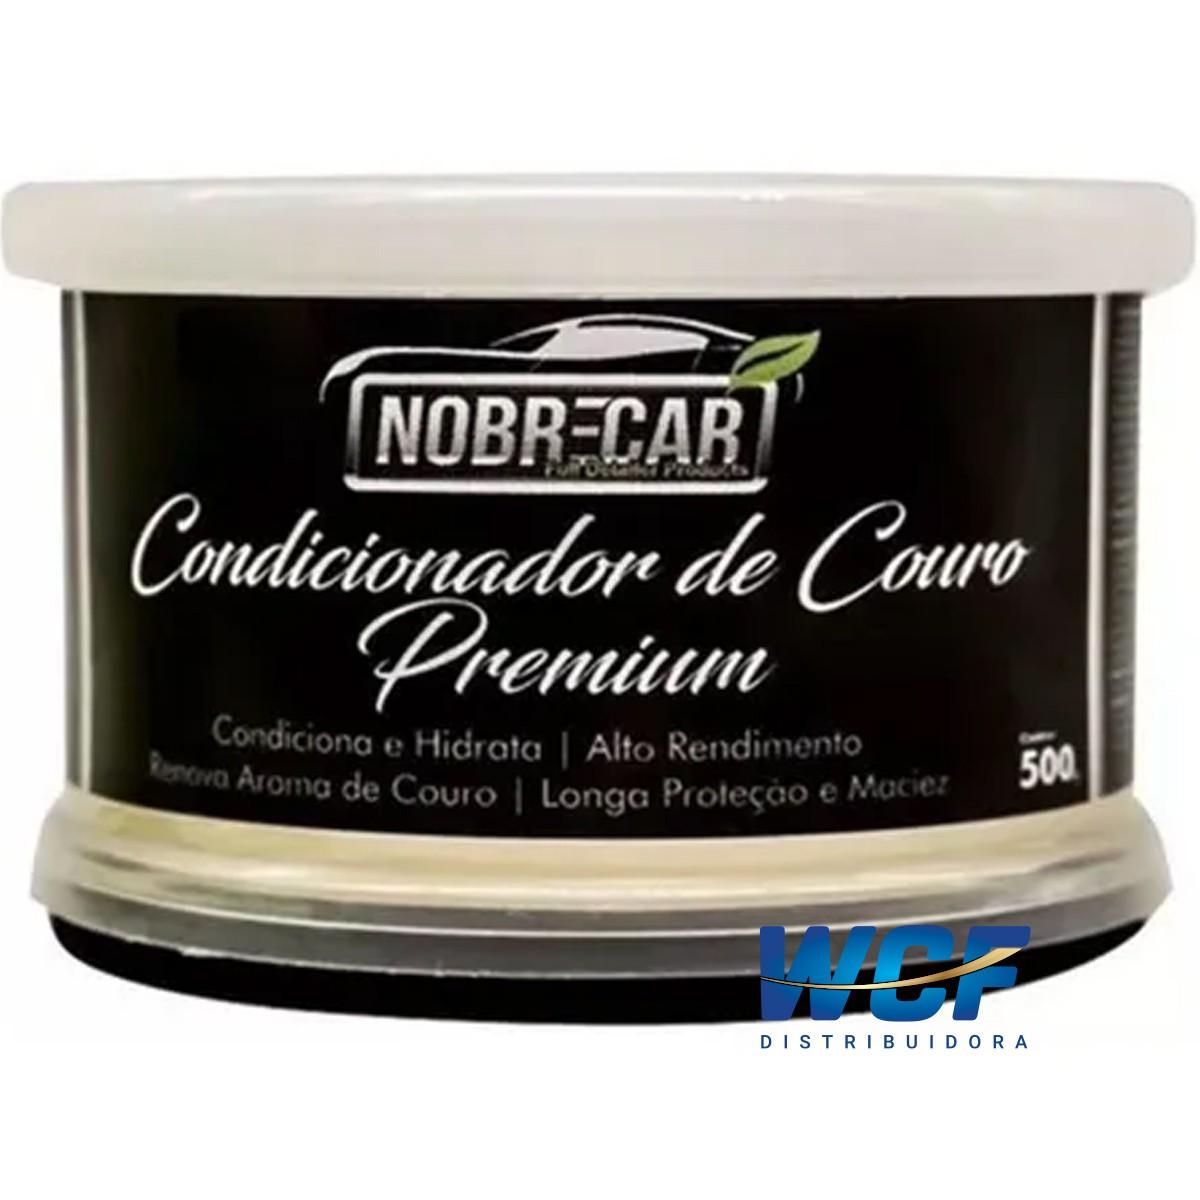 NOBRE CONDICIONADOR DE COURO PASTA PREMIUM 500GR